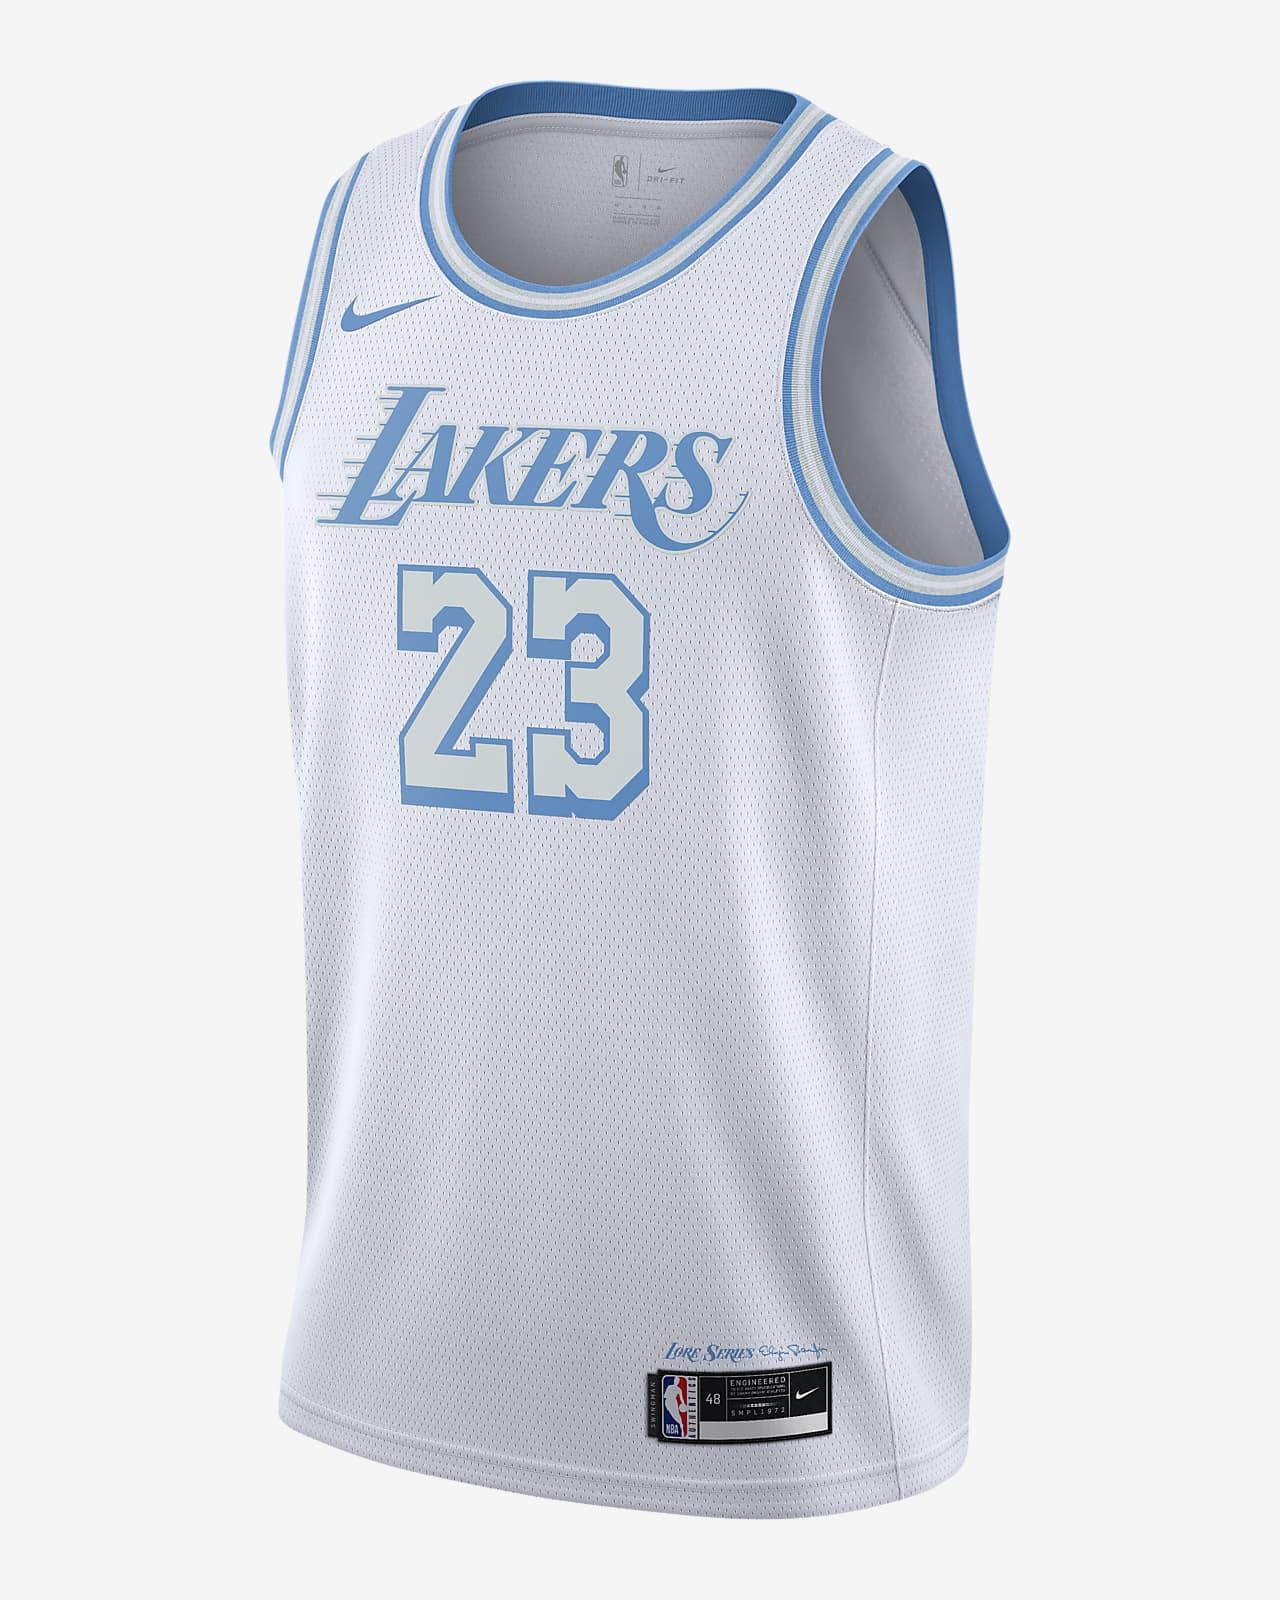 Los Angeles Lakers City Edition Nike NBA Swingman Jersey